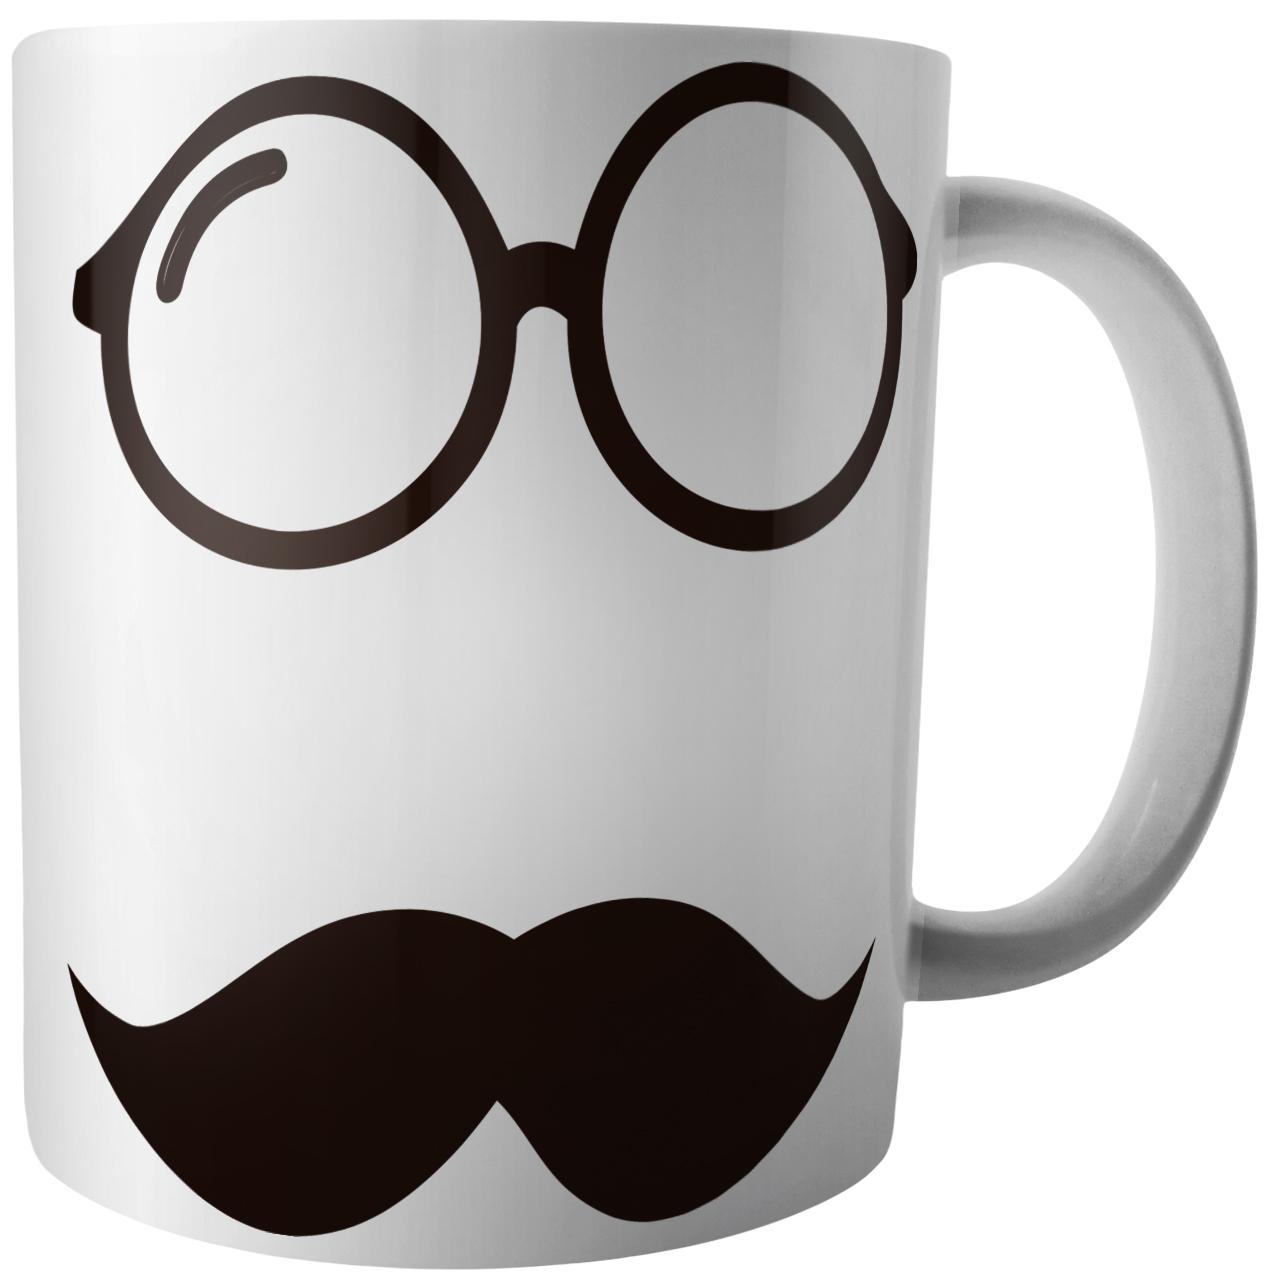 عکس ماگ آکو طرح عینک و سیبیل کد B303